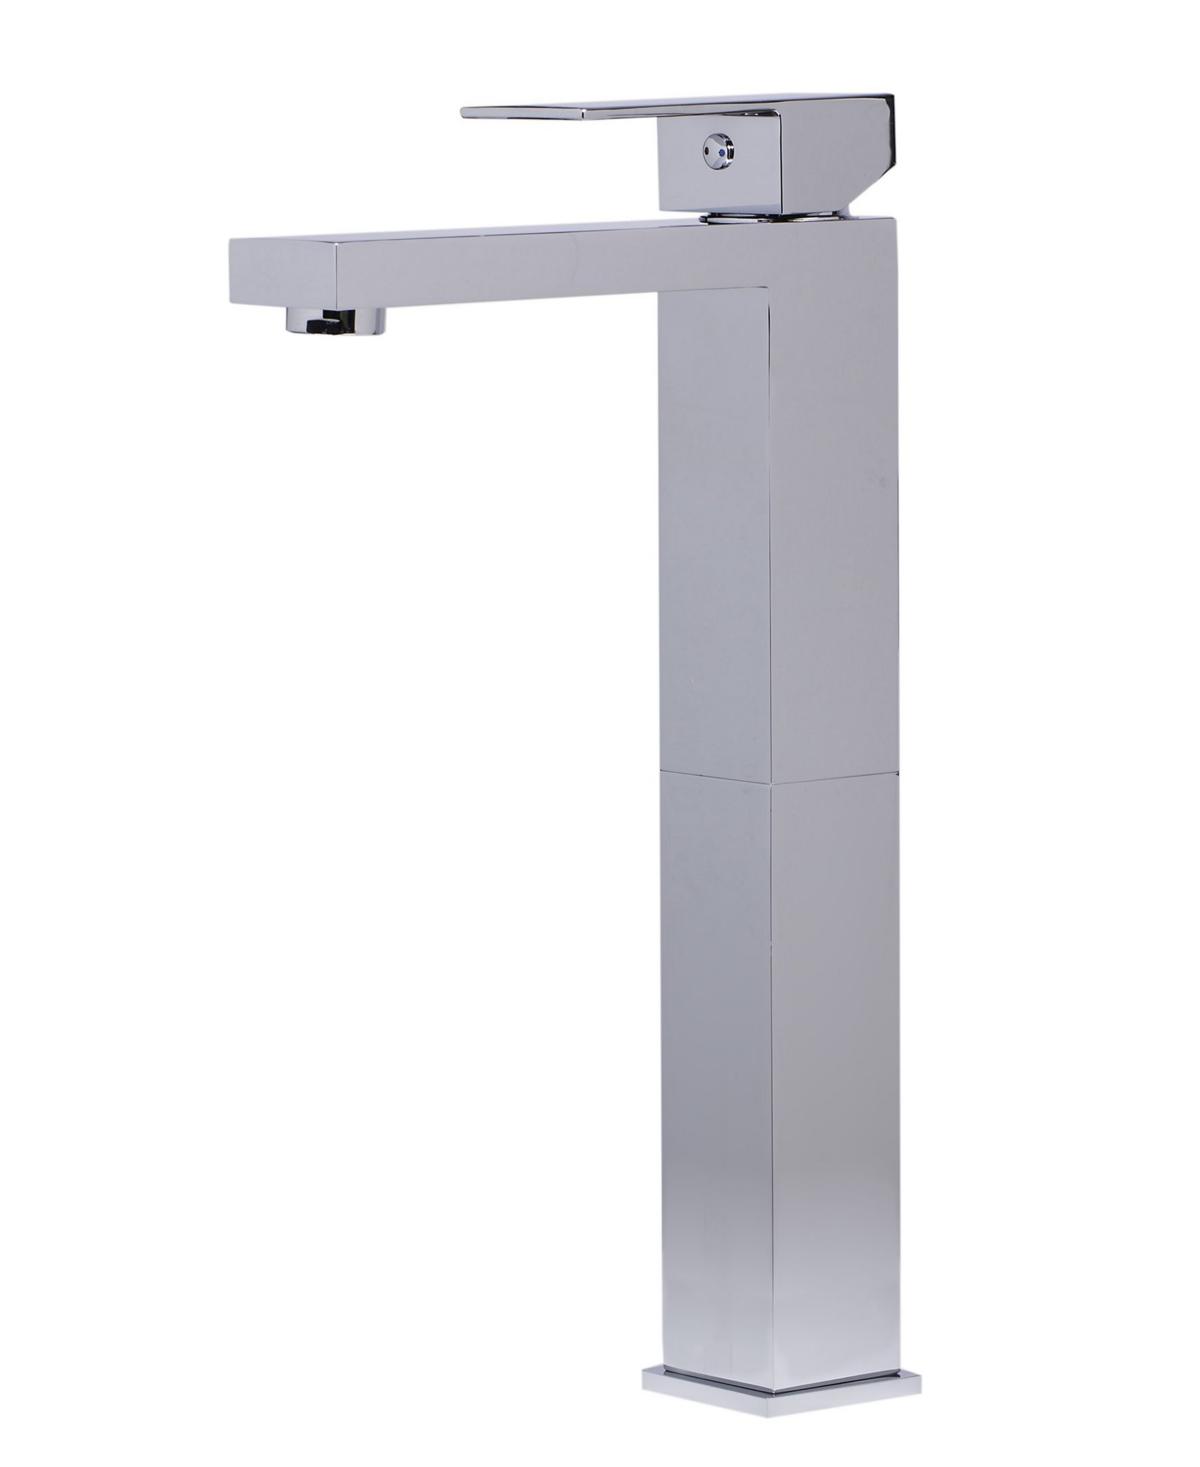 Alfi brand Polished Chrome Tall Square Single Lever Bathroom Faucet Bedding